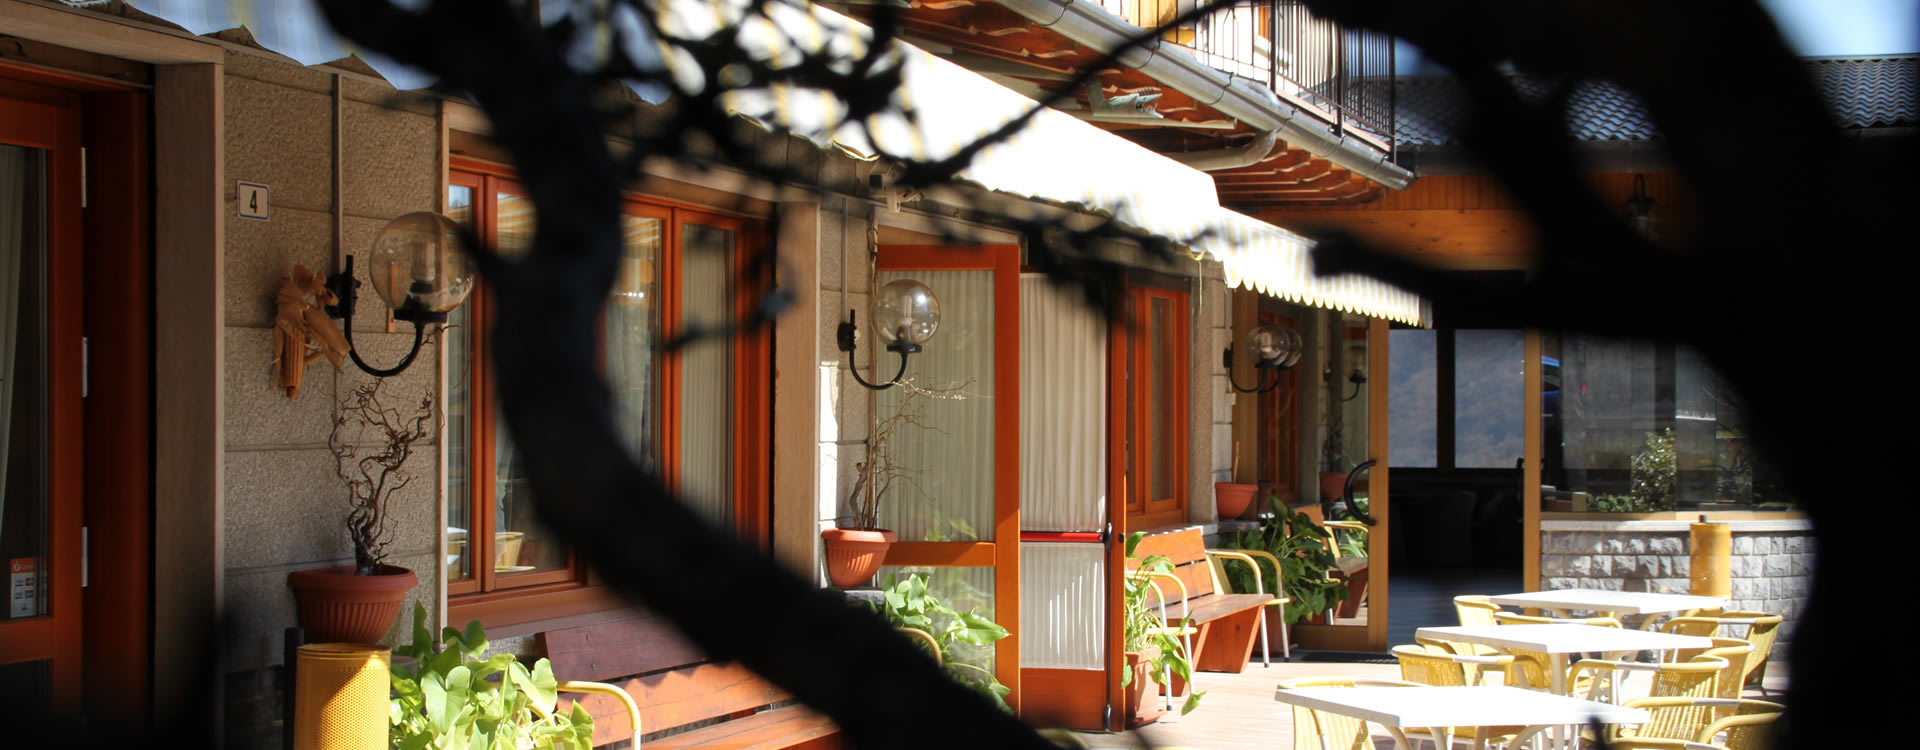 hotel_valle_imagna_01